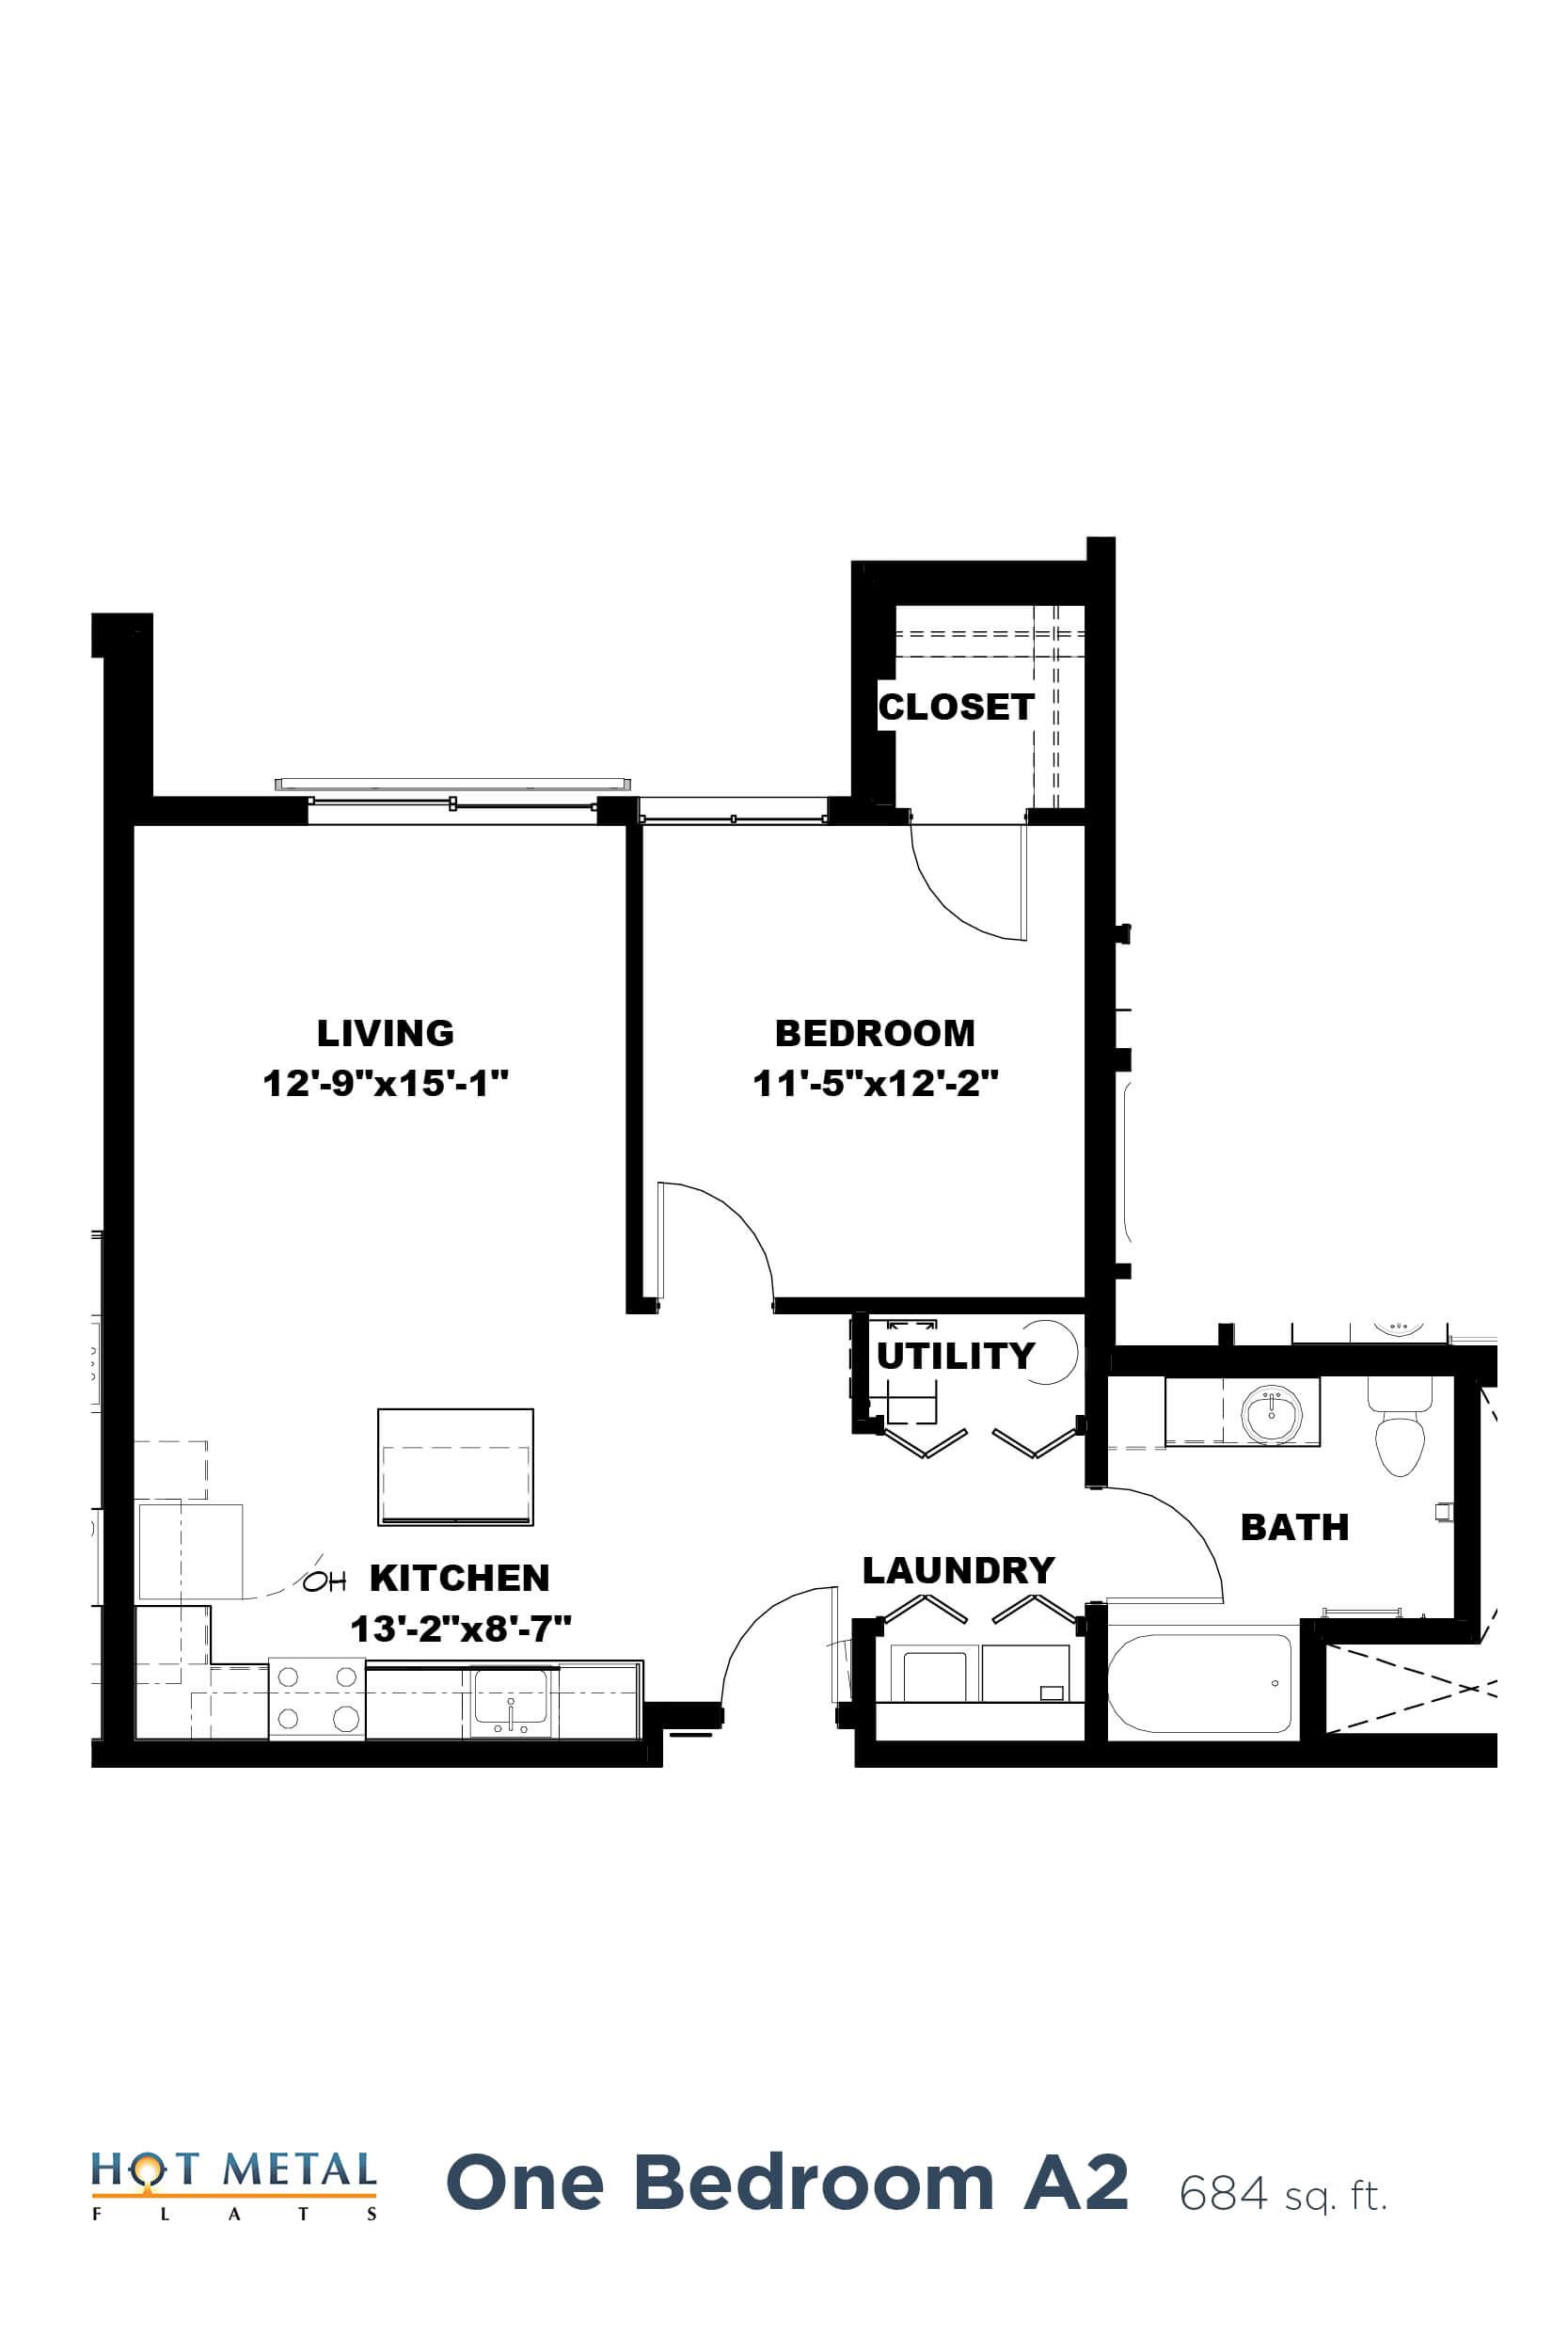 Floor Plan  Hot Metal Flats A2 floorplan, Hot Metal Flats apartments, Pittsburgh, PA, opens a dialog